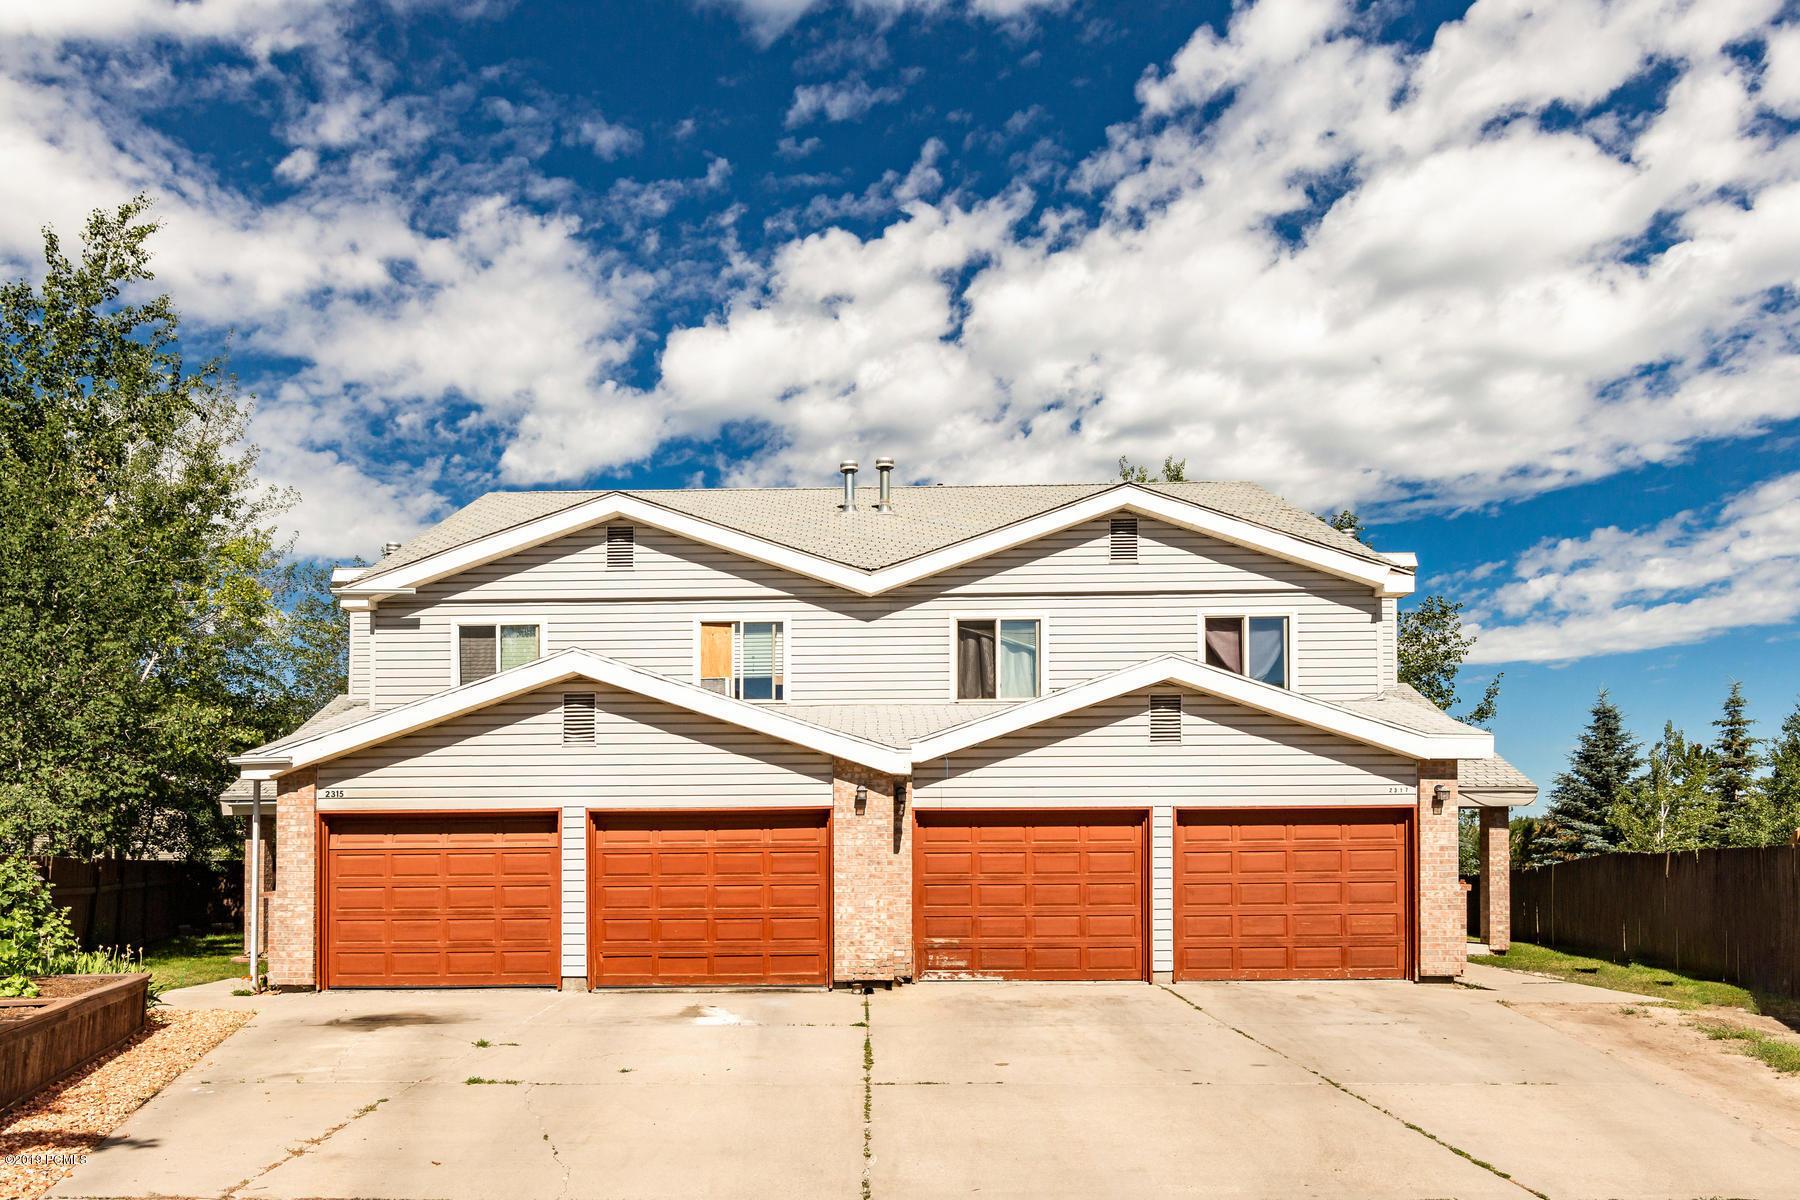 2315/2317 Calumet Circle, Park City, Utah 84060, 6 Bedrooms Bedrooms, ,6 BathroomsBathrooms,Single Family,For Sale,Calumet,11907216